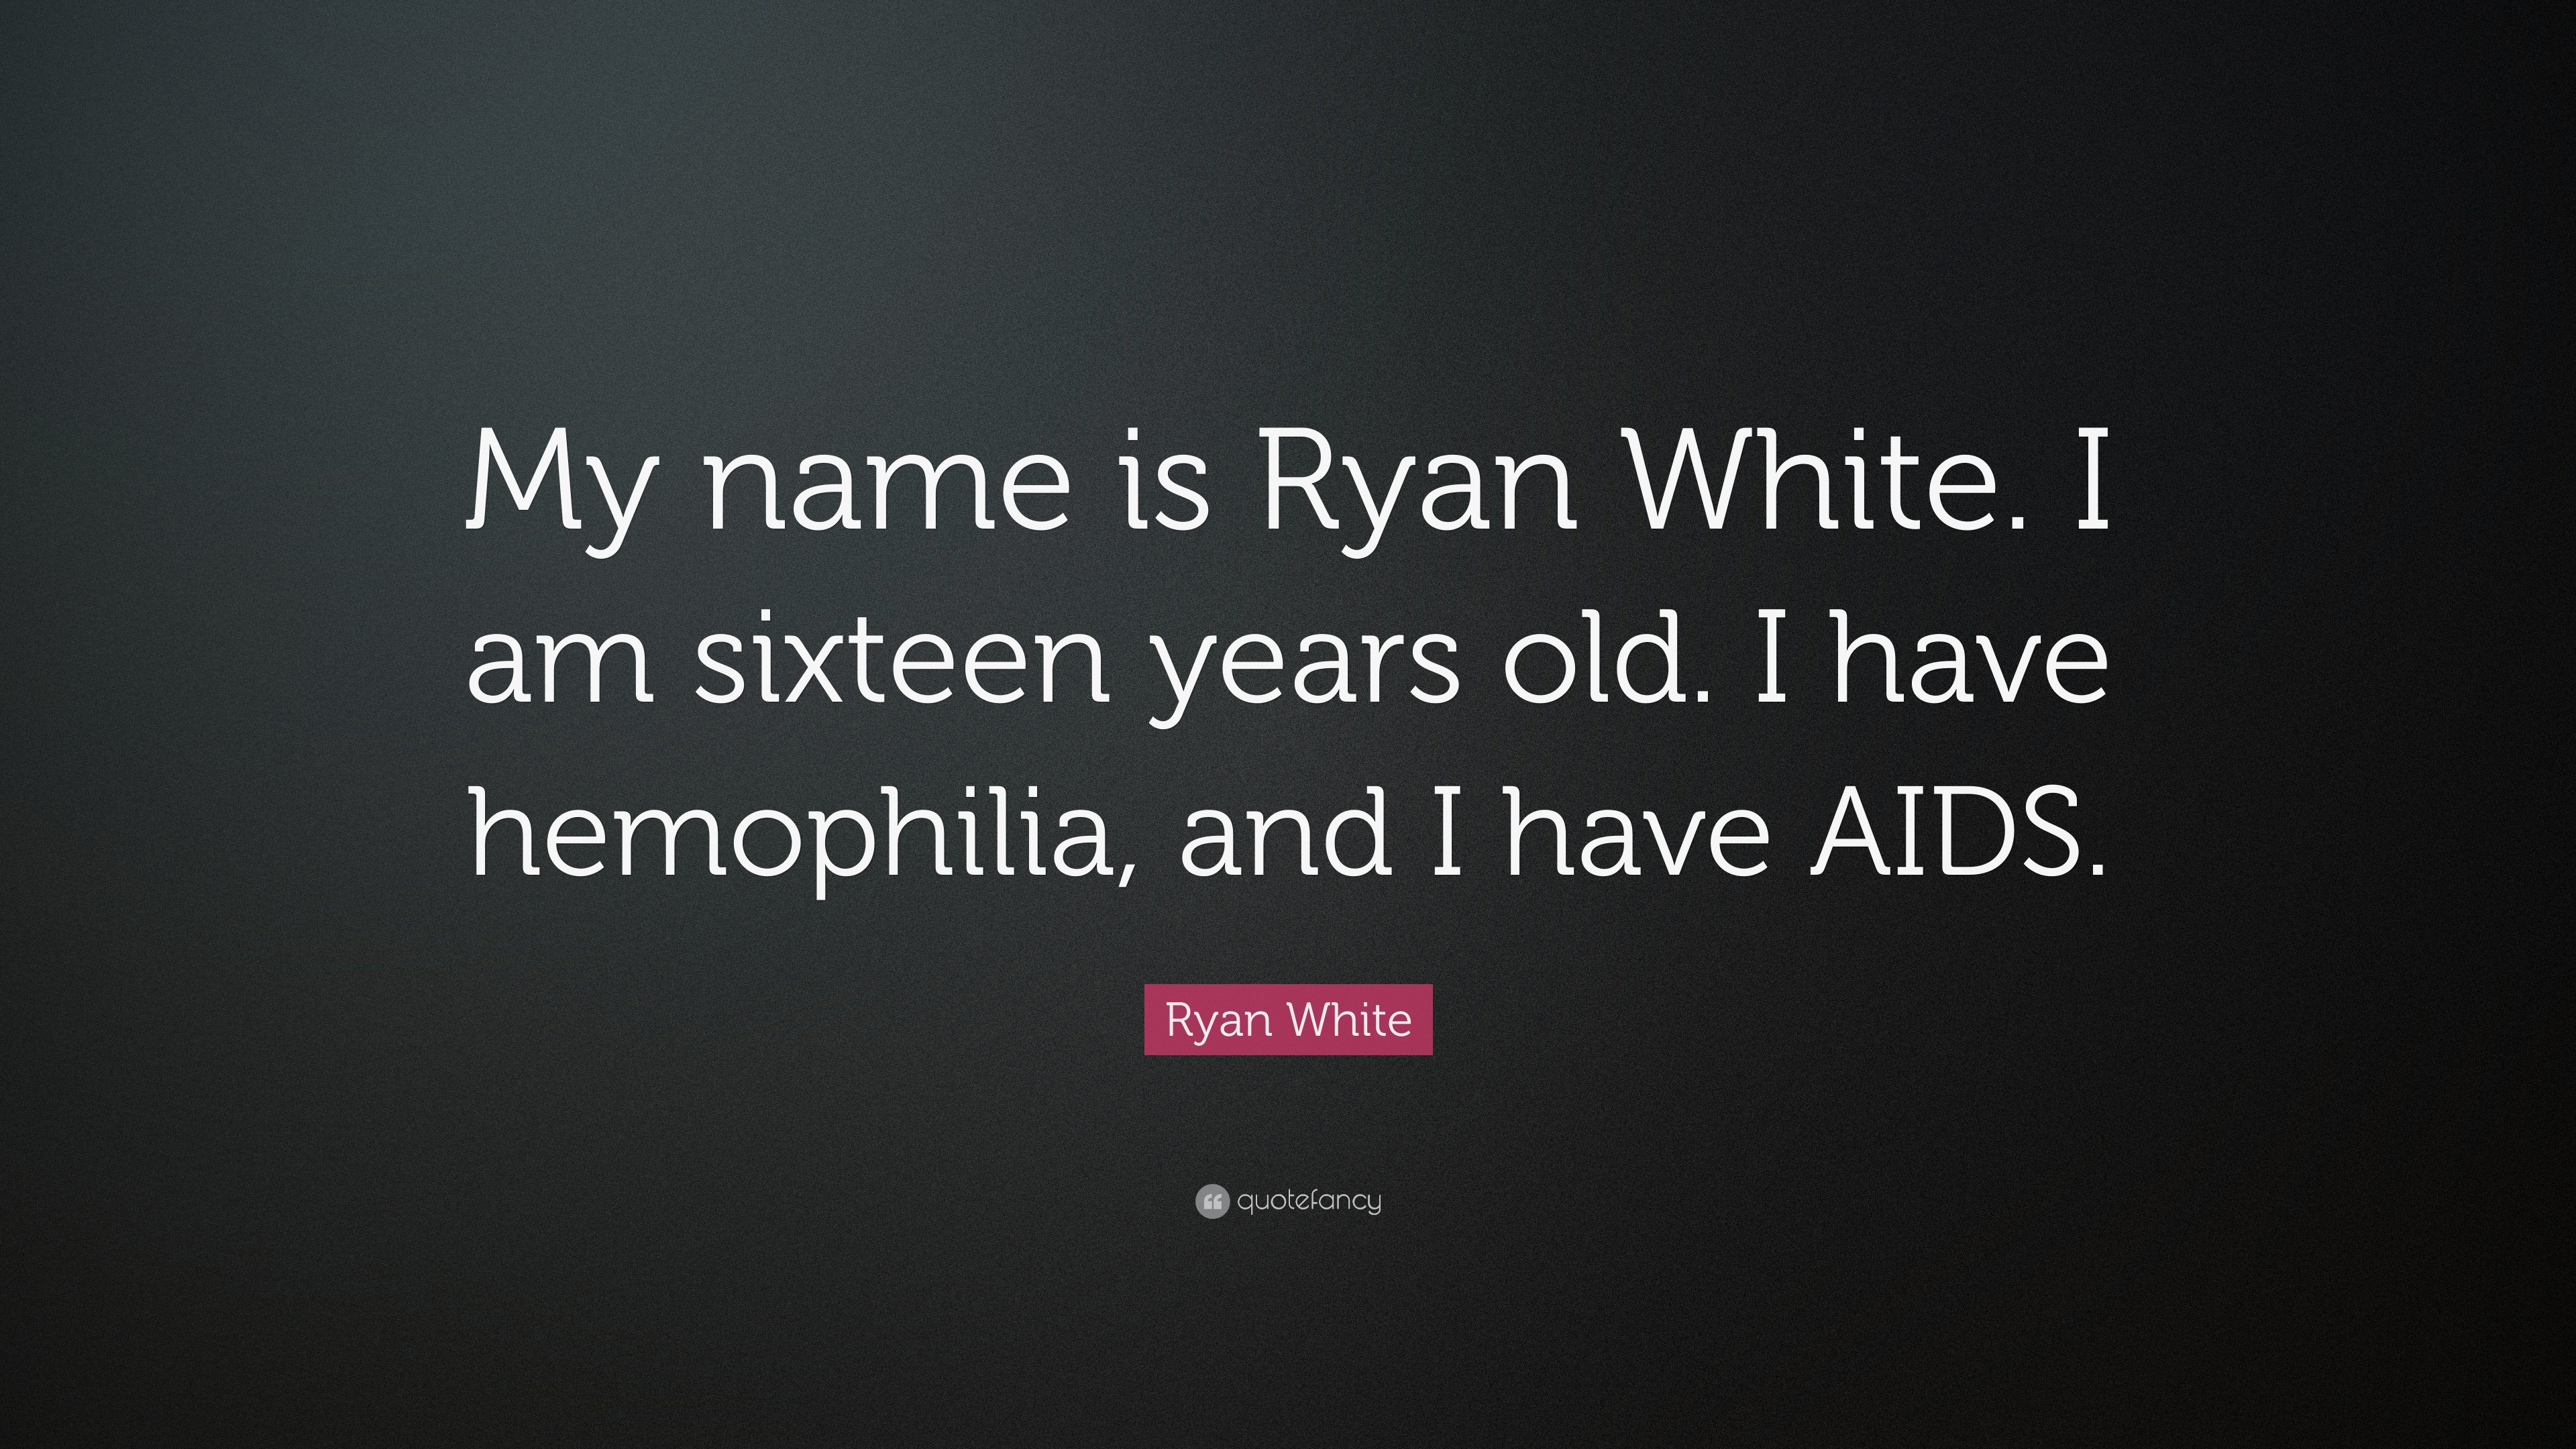 Ryan white quotes 25 wallpapers quotefancy - Ryan name wallpaper ...